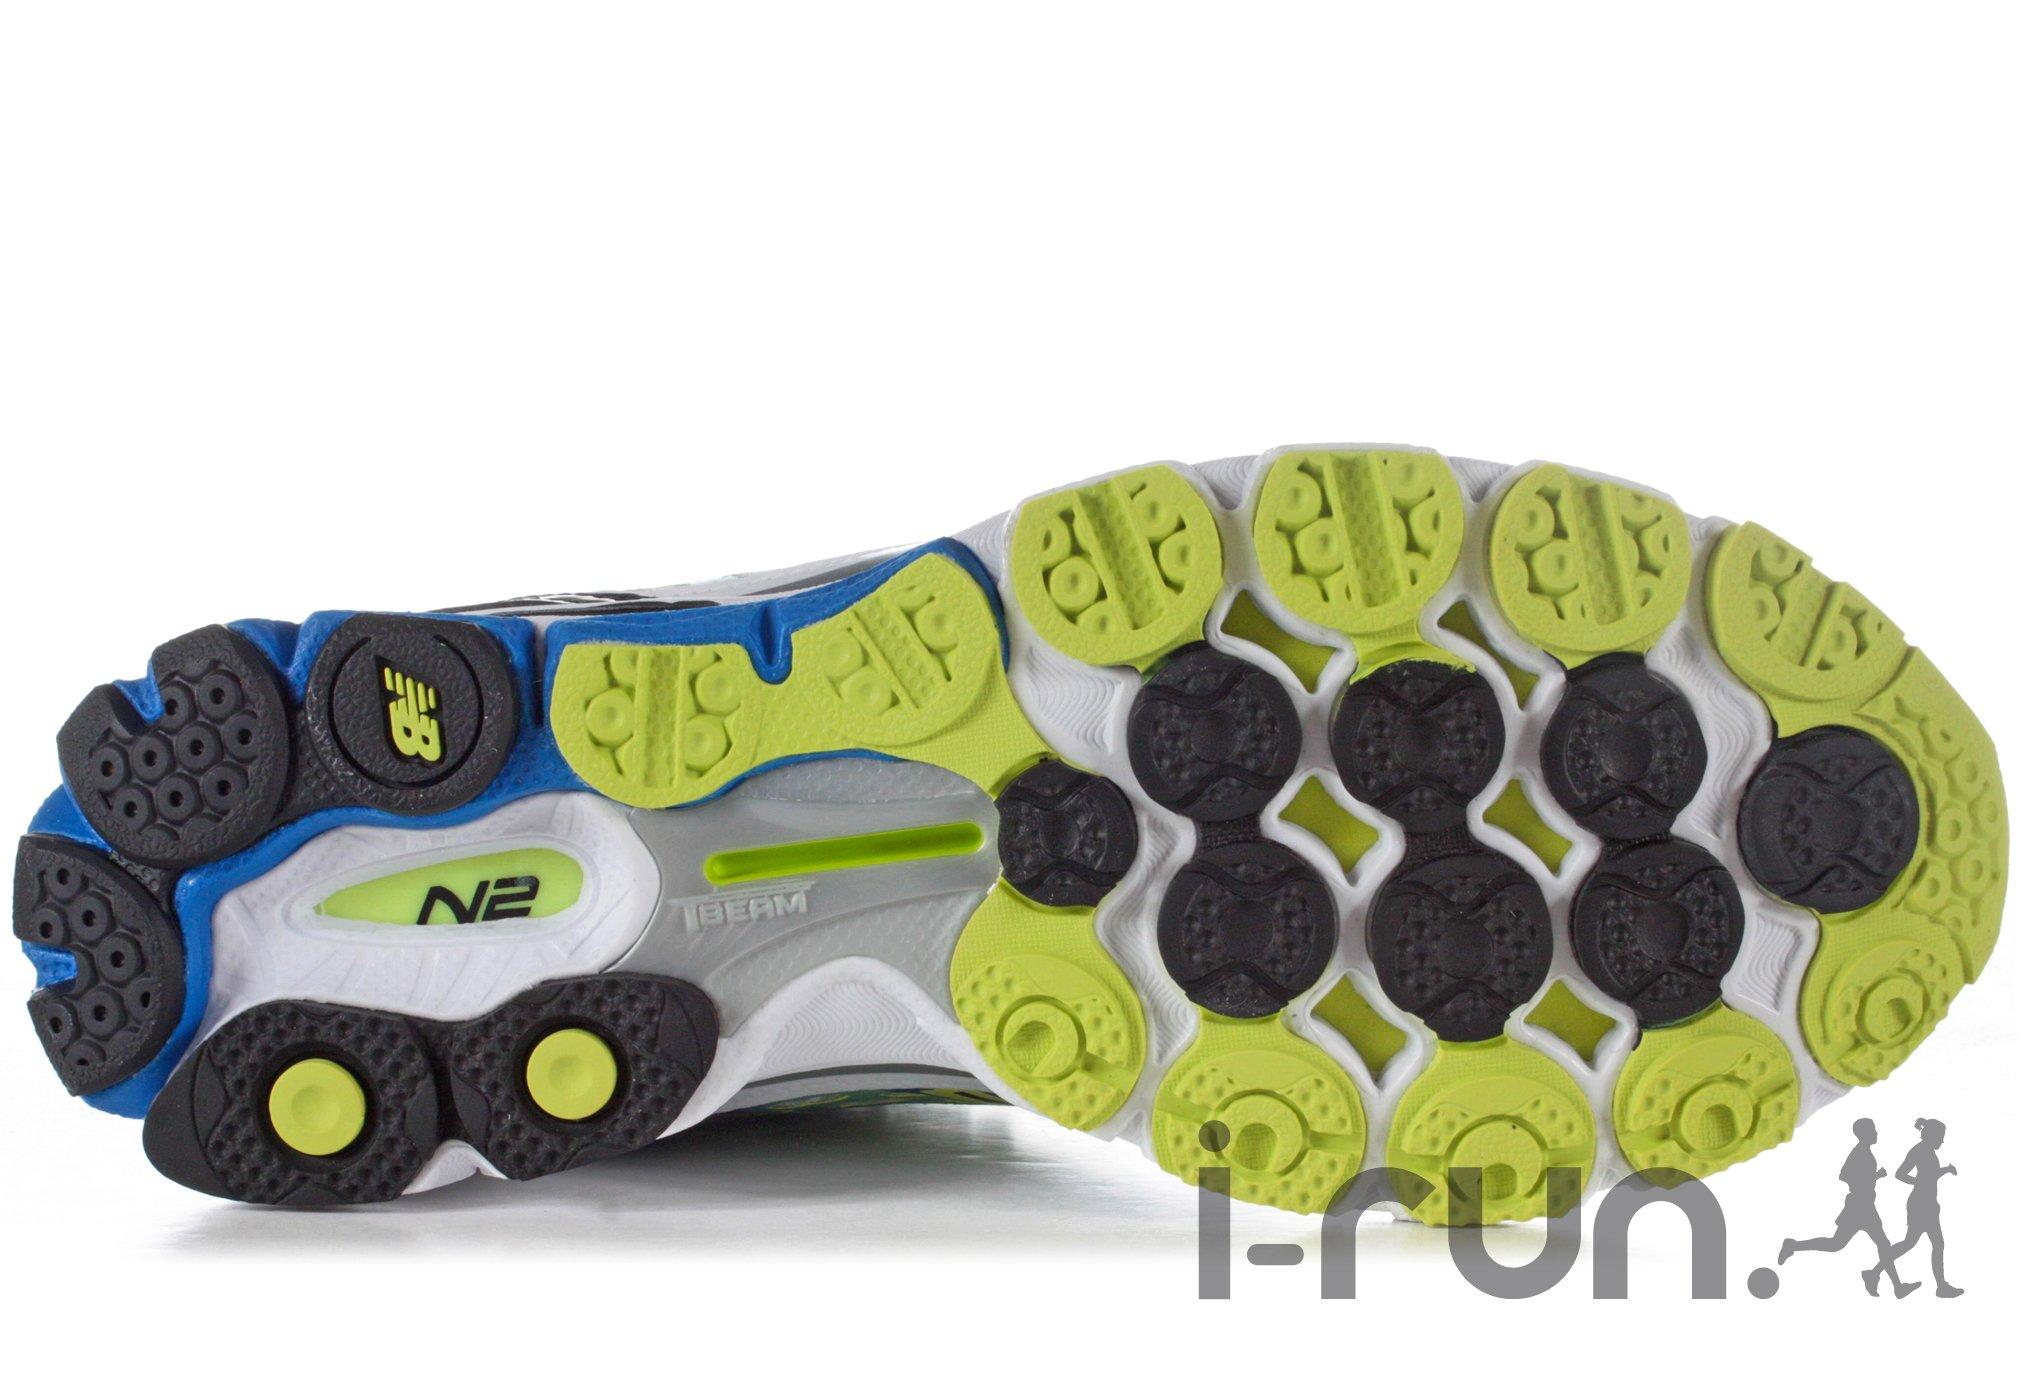 Chaussures Running New Balance V3 2e 1080 M lJcuTF51K3